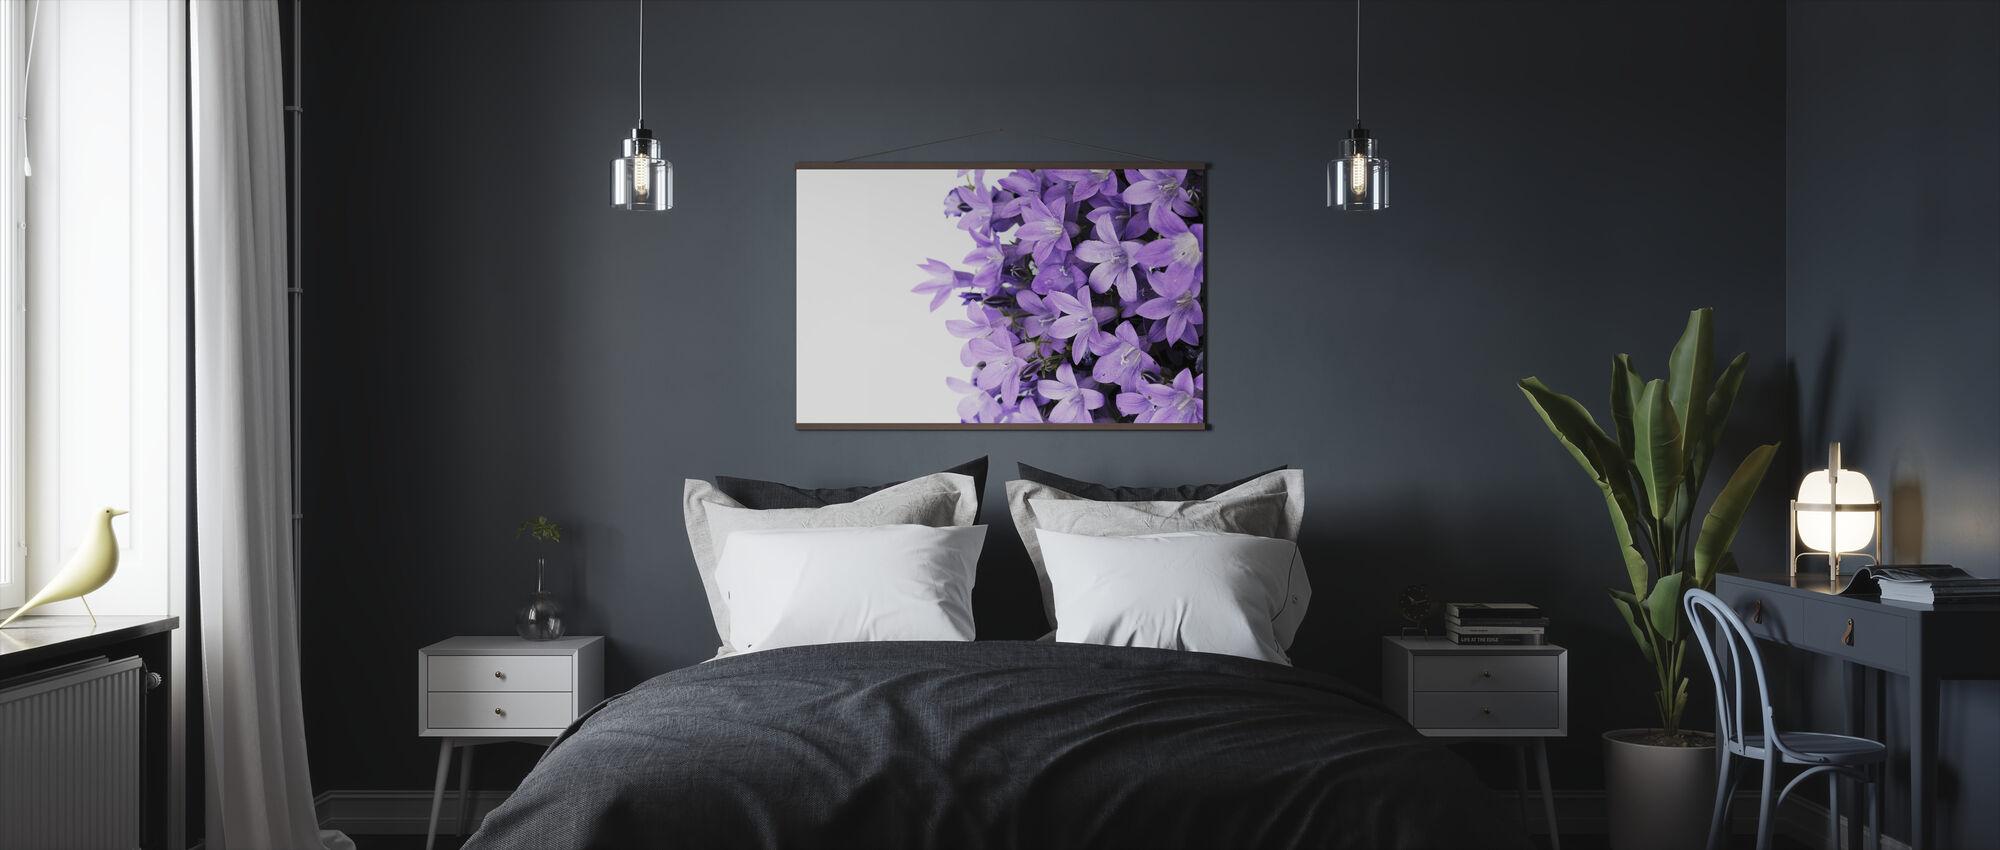 Purple Flowers - Poster - Bedroom